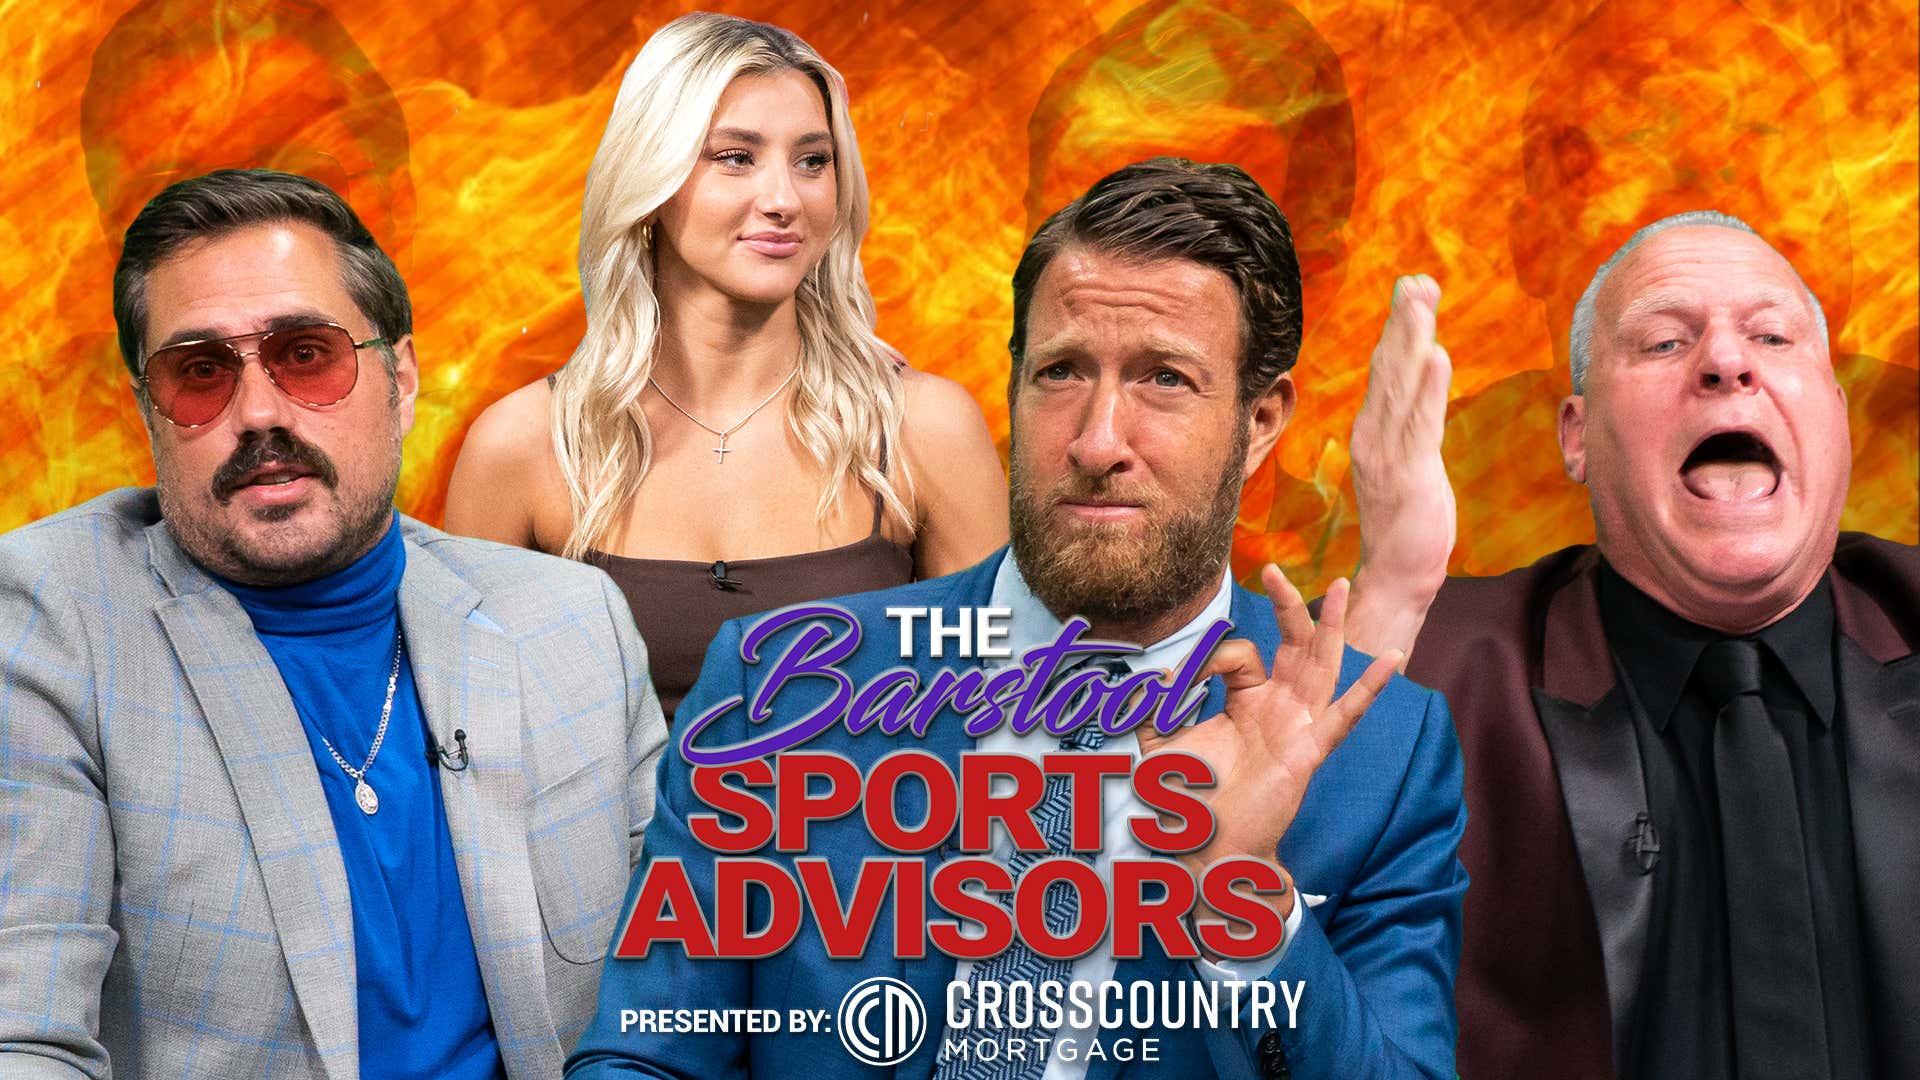 The Barstool Sports Advisors are Back for NFL Week 2